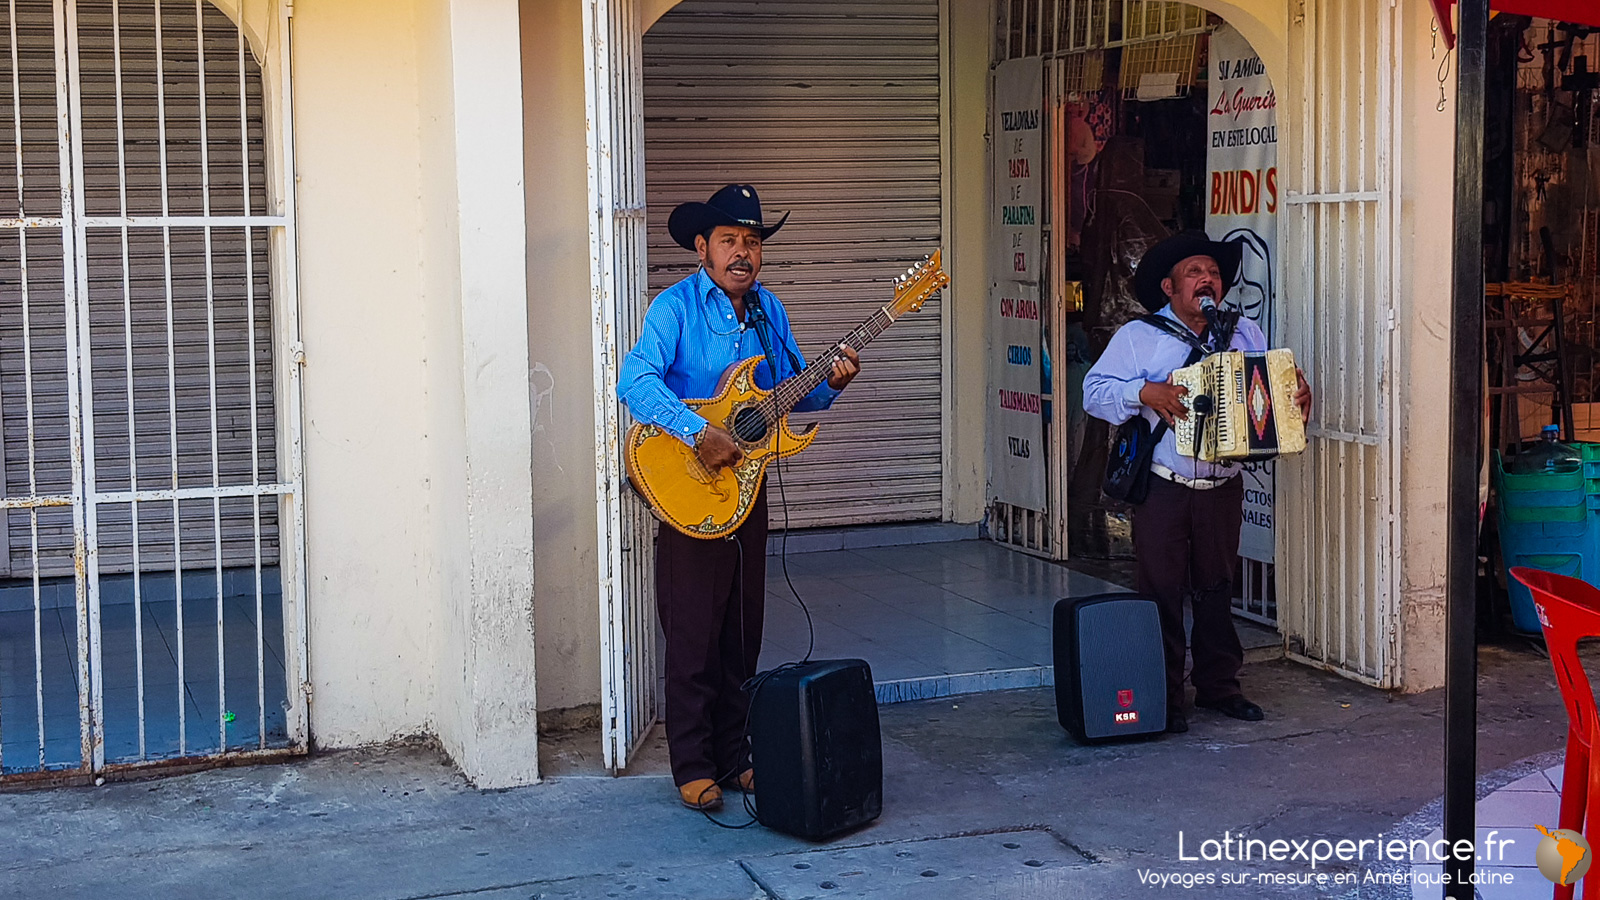 Mexique - Cancun - Musicien - Latinexperience voyages